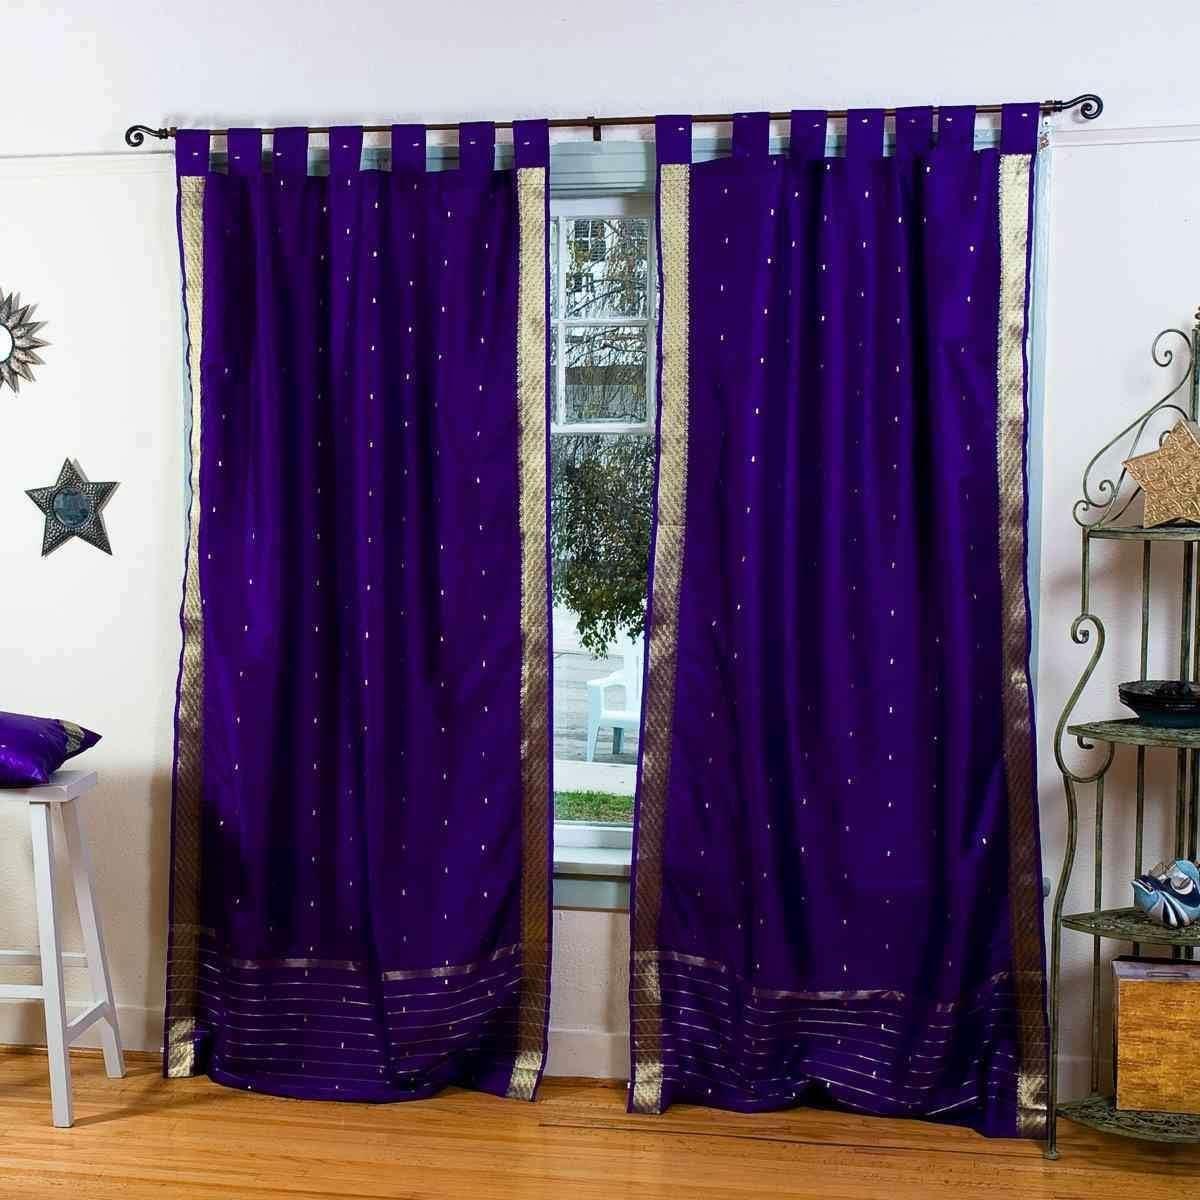 Indian Selections Lined-Purple Tab Top Sheer Sari Curtain Drape Panel – 60W x 108L – Pair